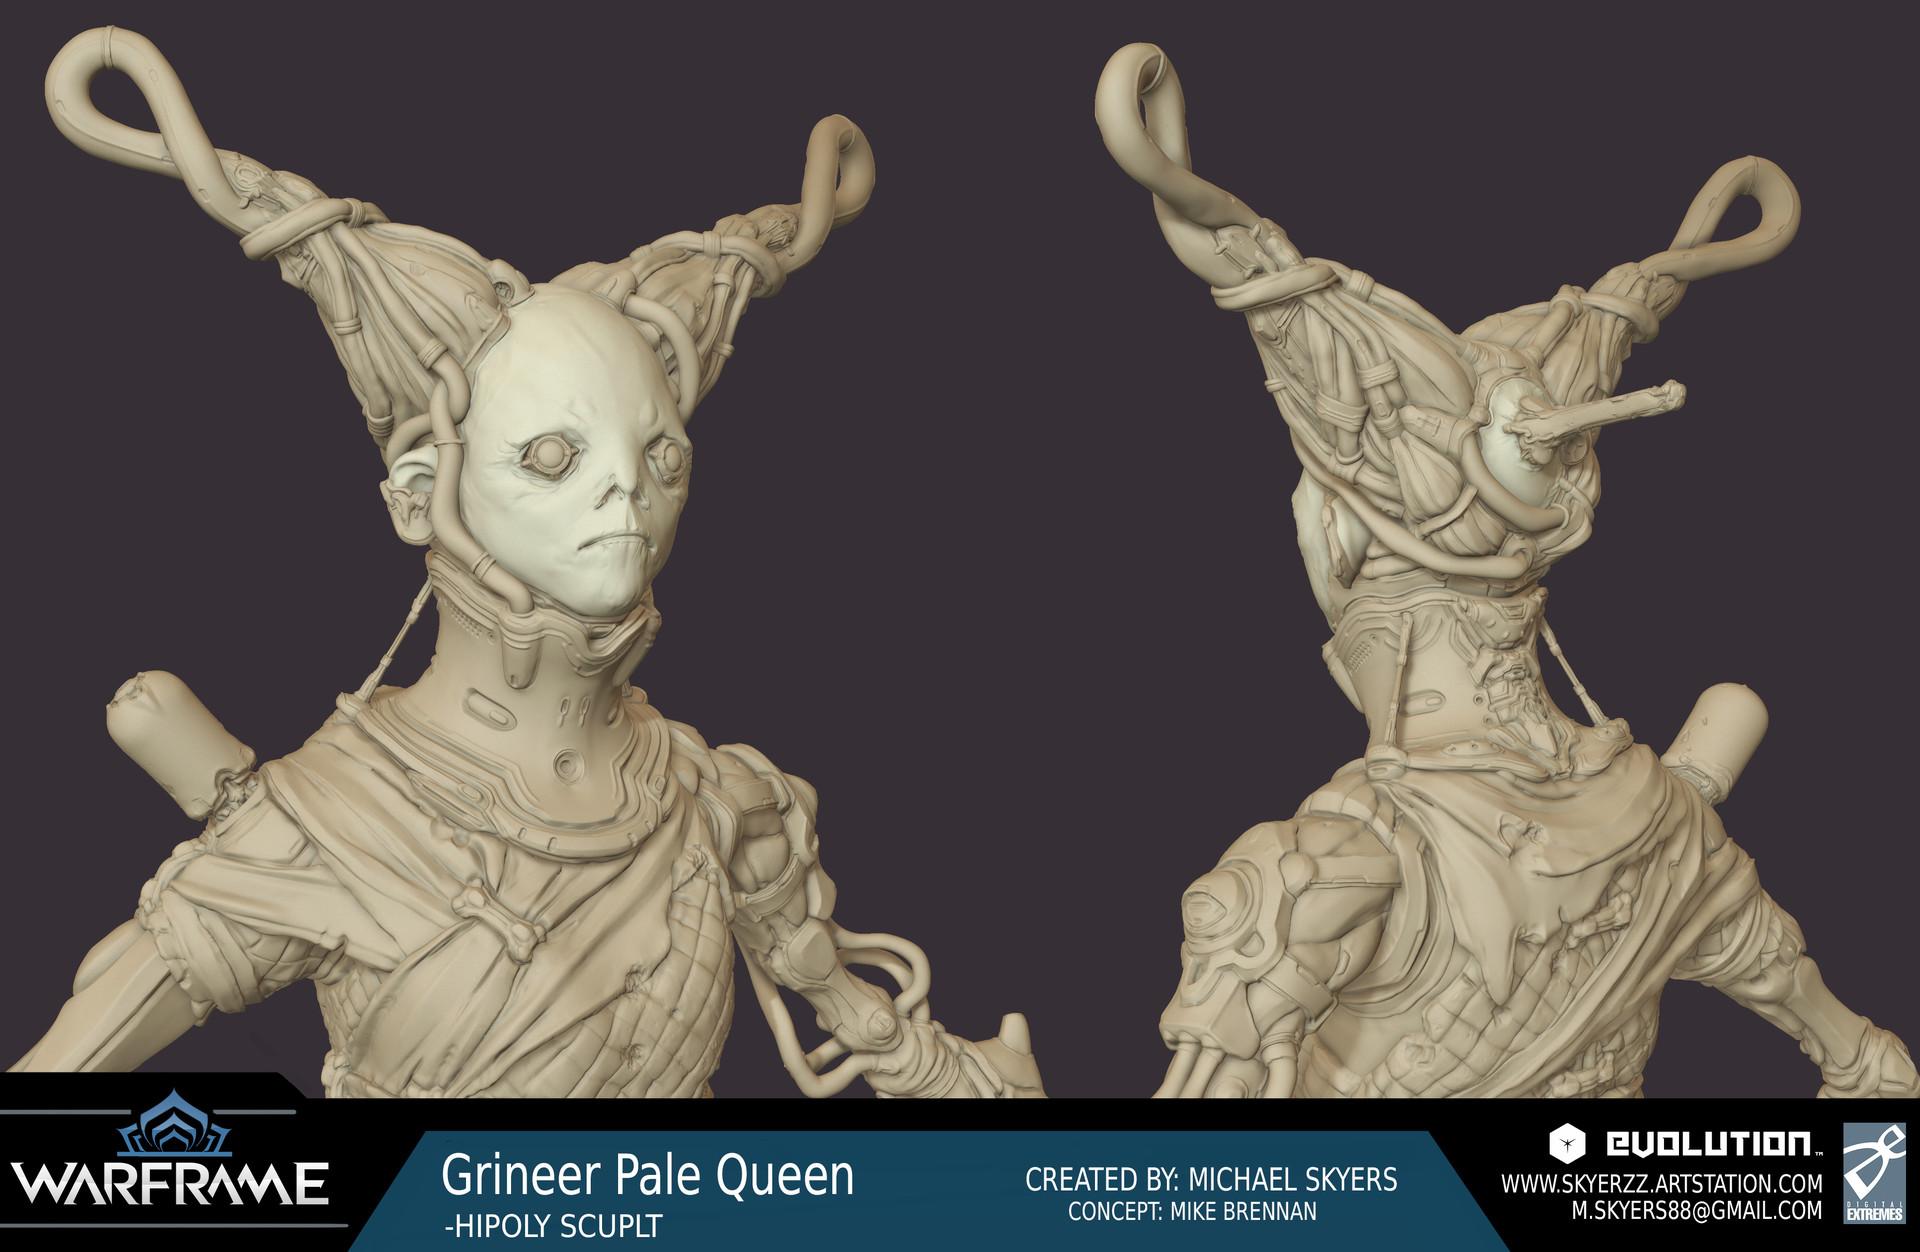 Michael Skyers Warframe Worm Pale Queen